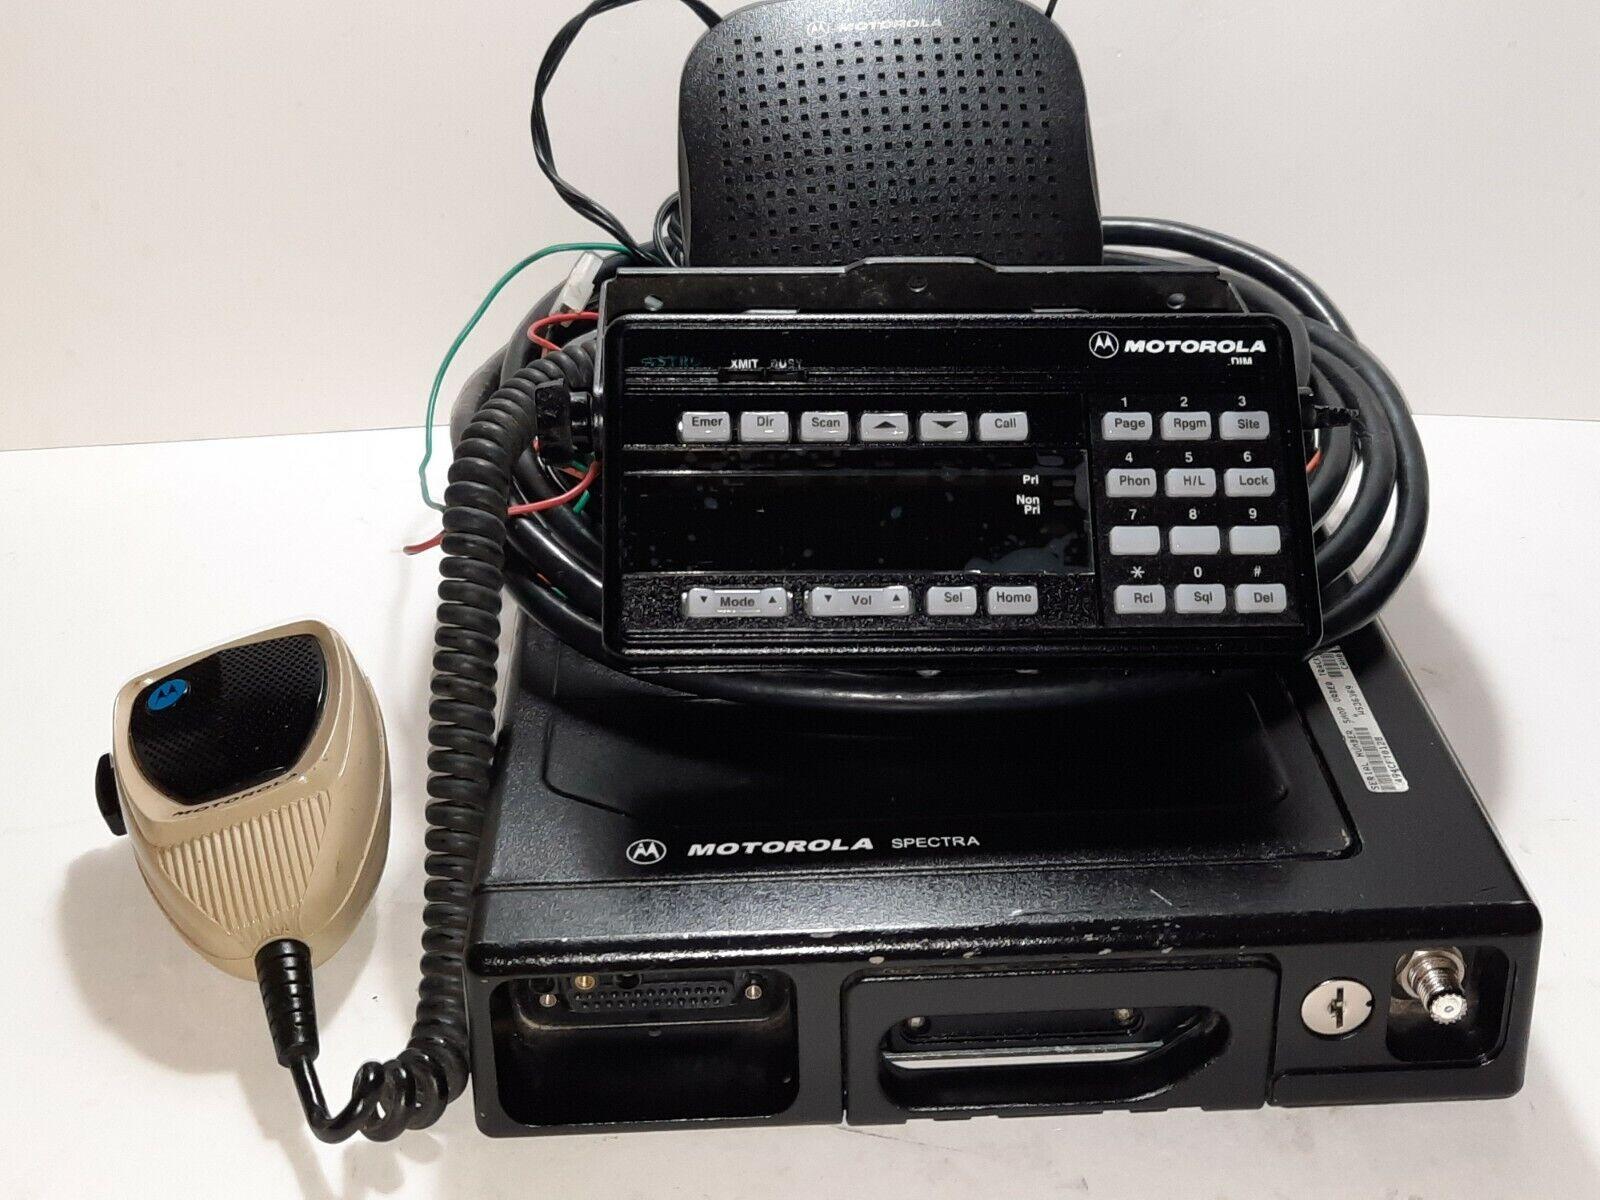 Motorola ASTRO SPECTRA PLUS XTL5000 RADIO VHF 146-174MHz 110 WATT 512CH P25 ADP. Buy it now for 550.00